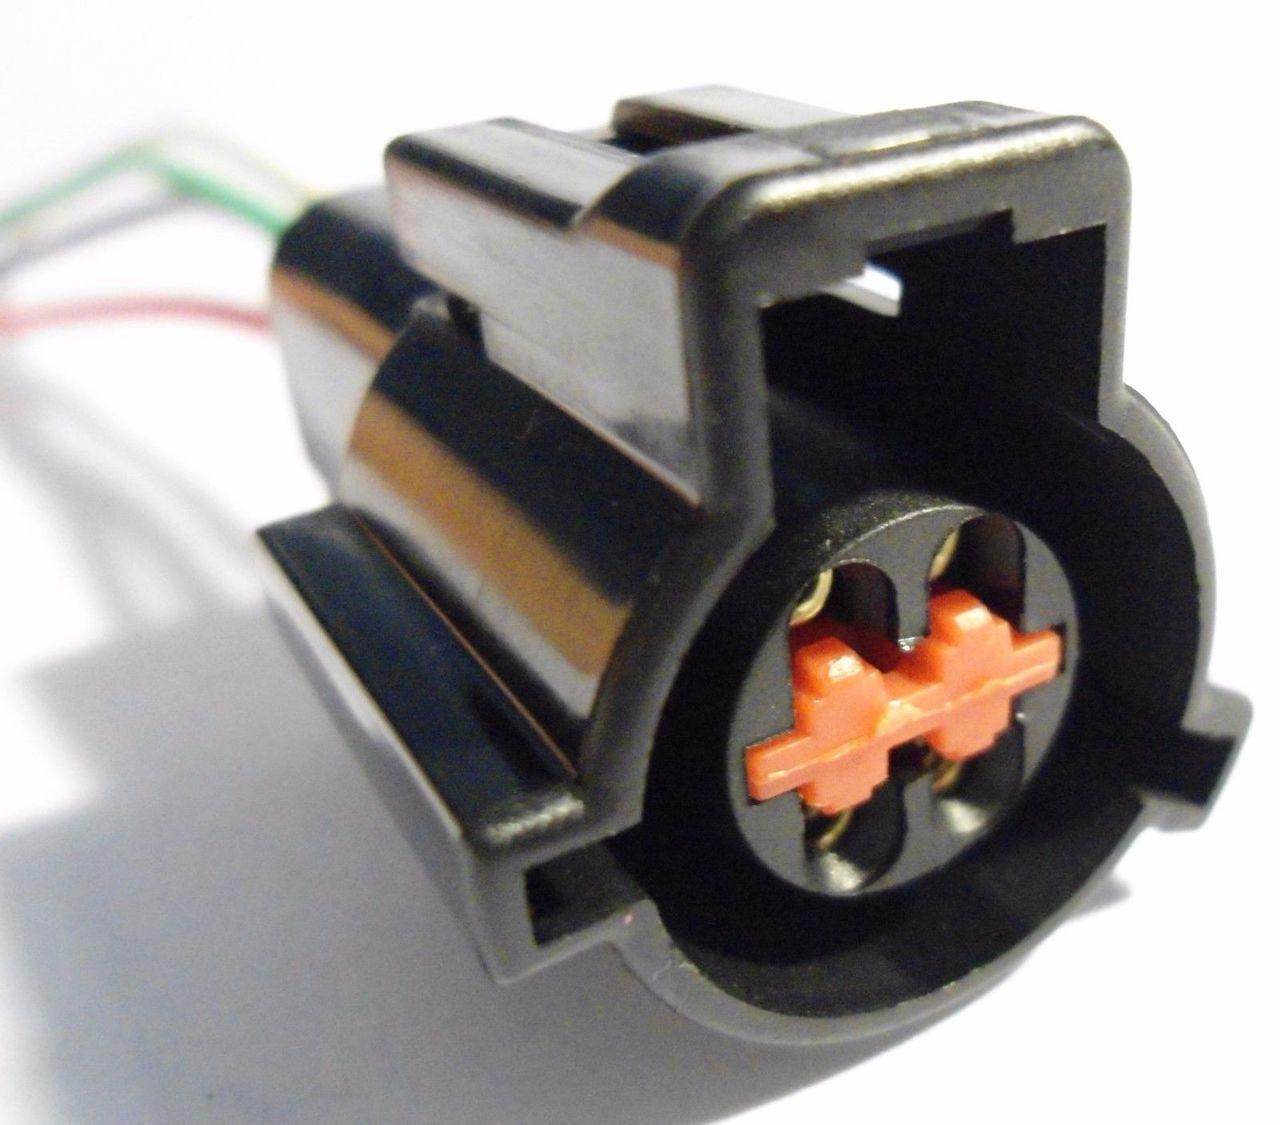 hight resolution of connector 4 way fuel pump oxygen o2 sensor harness pigtail ford 89 95 wpt112 c godaca llc